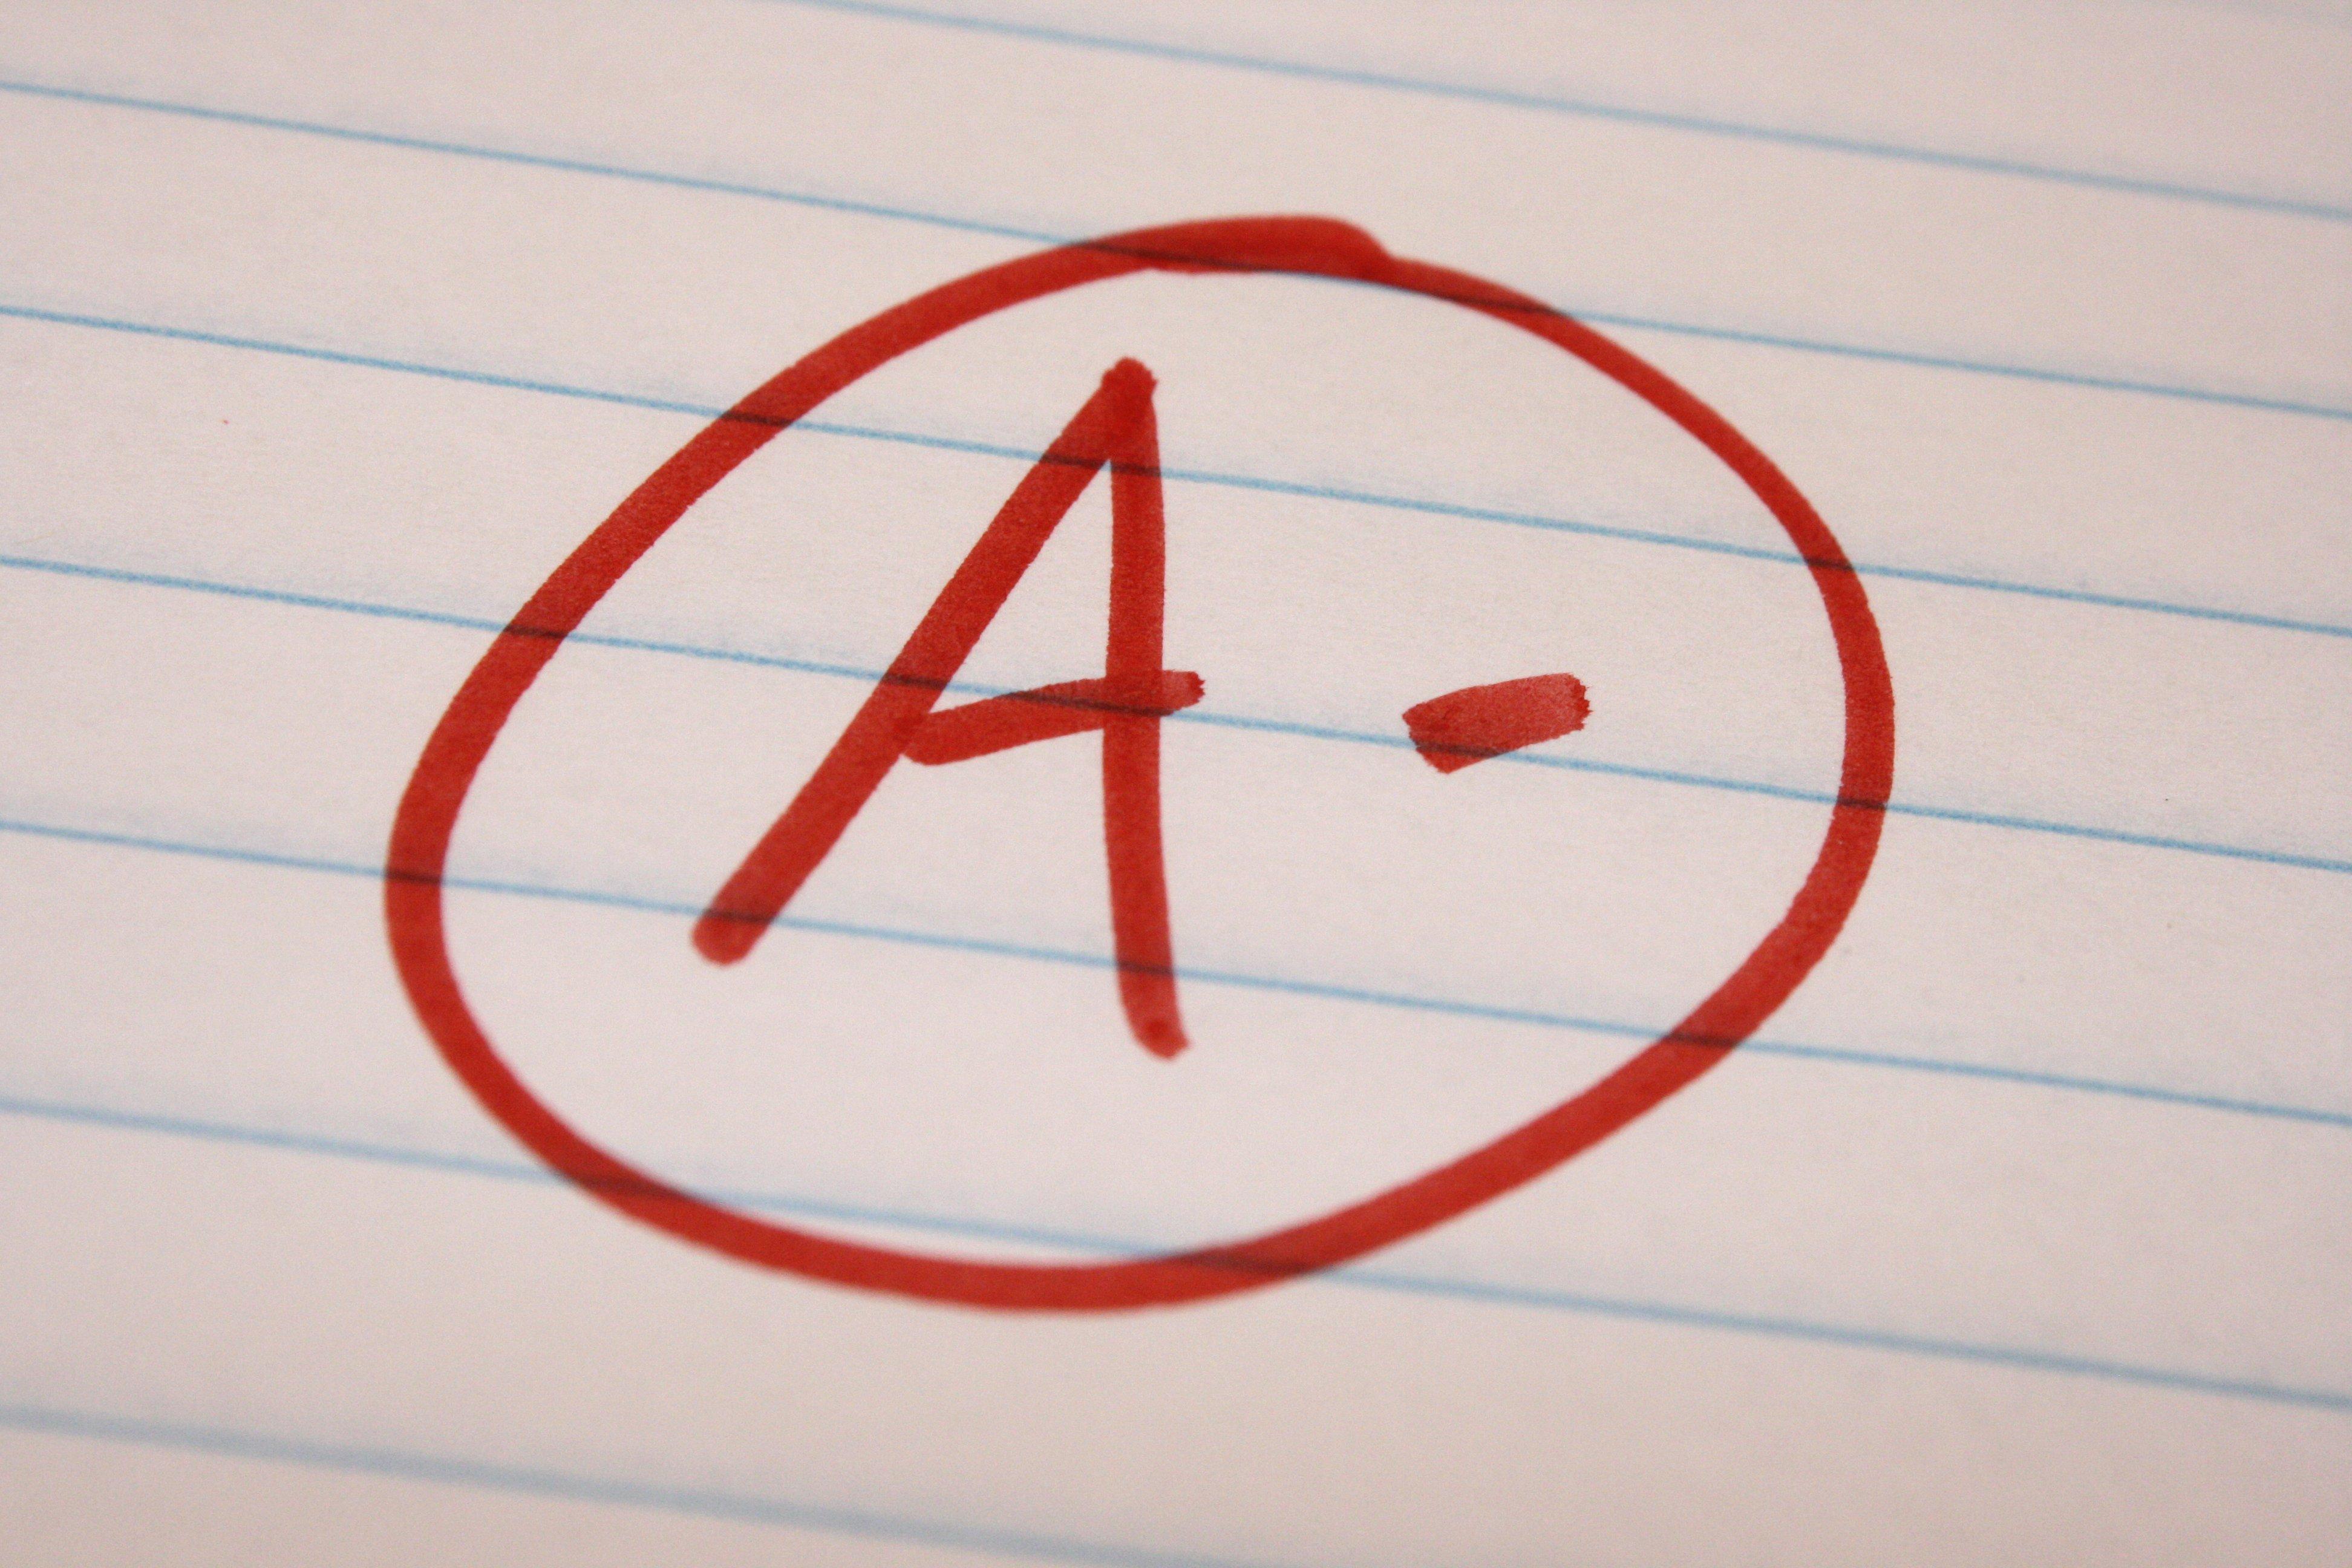 School Letter Grades a Minus School Letter Grade